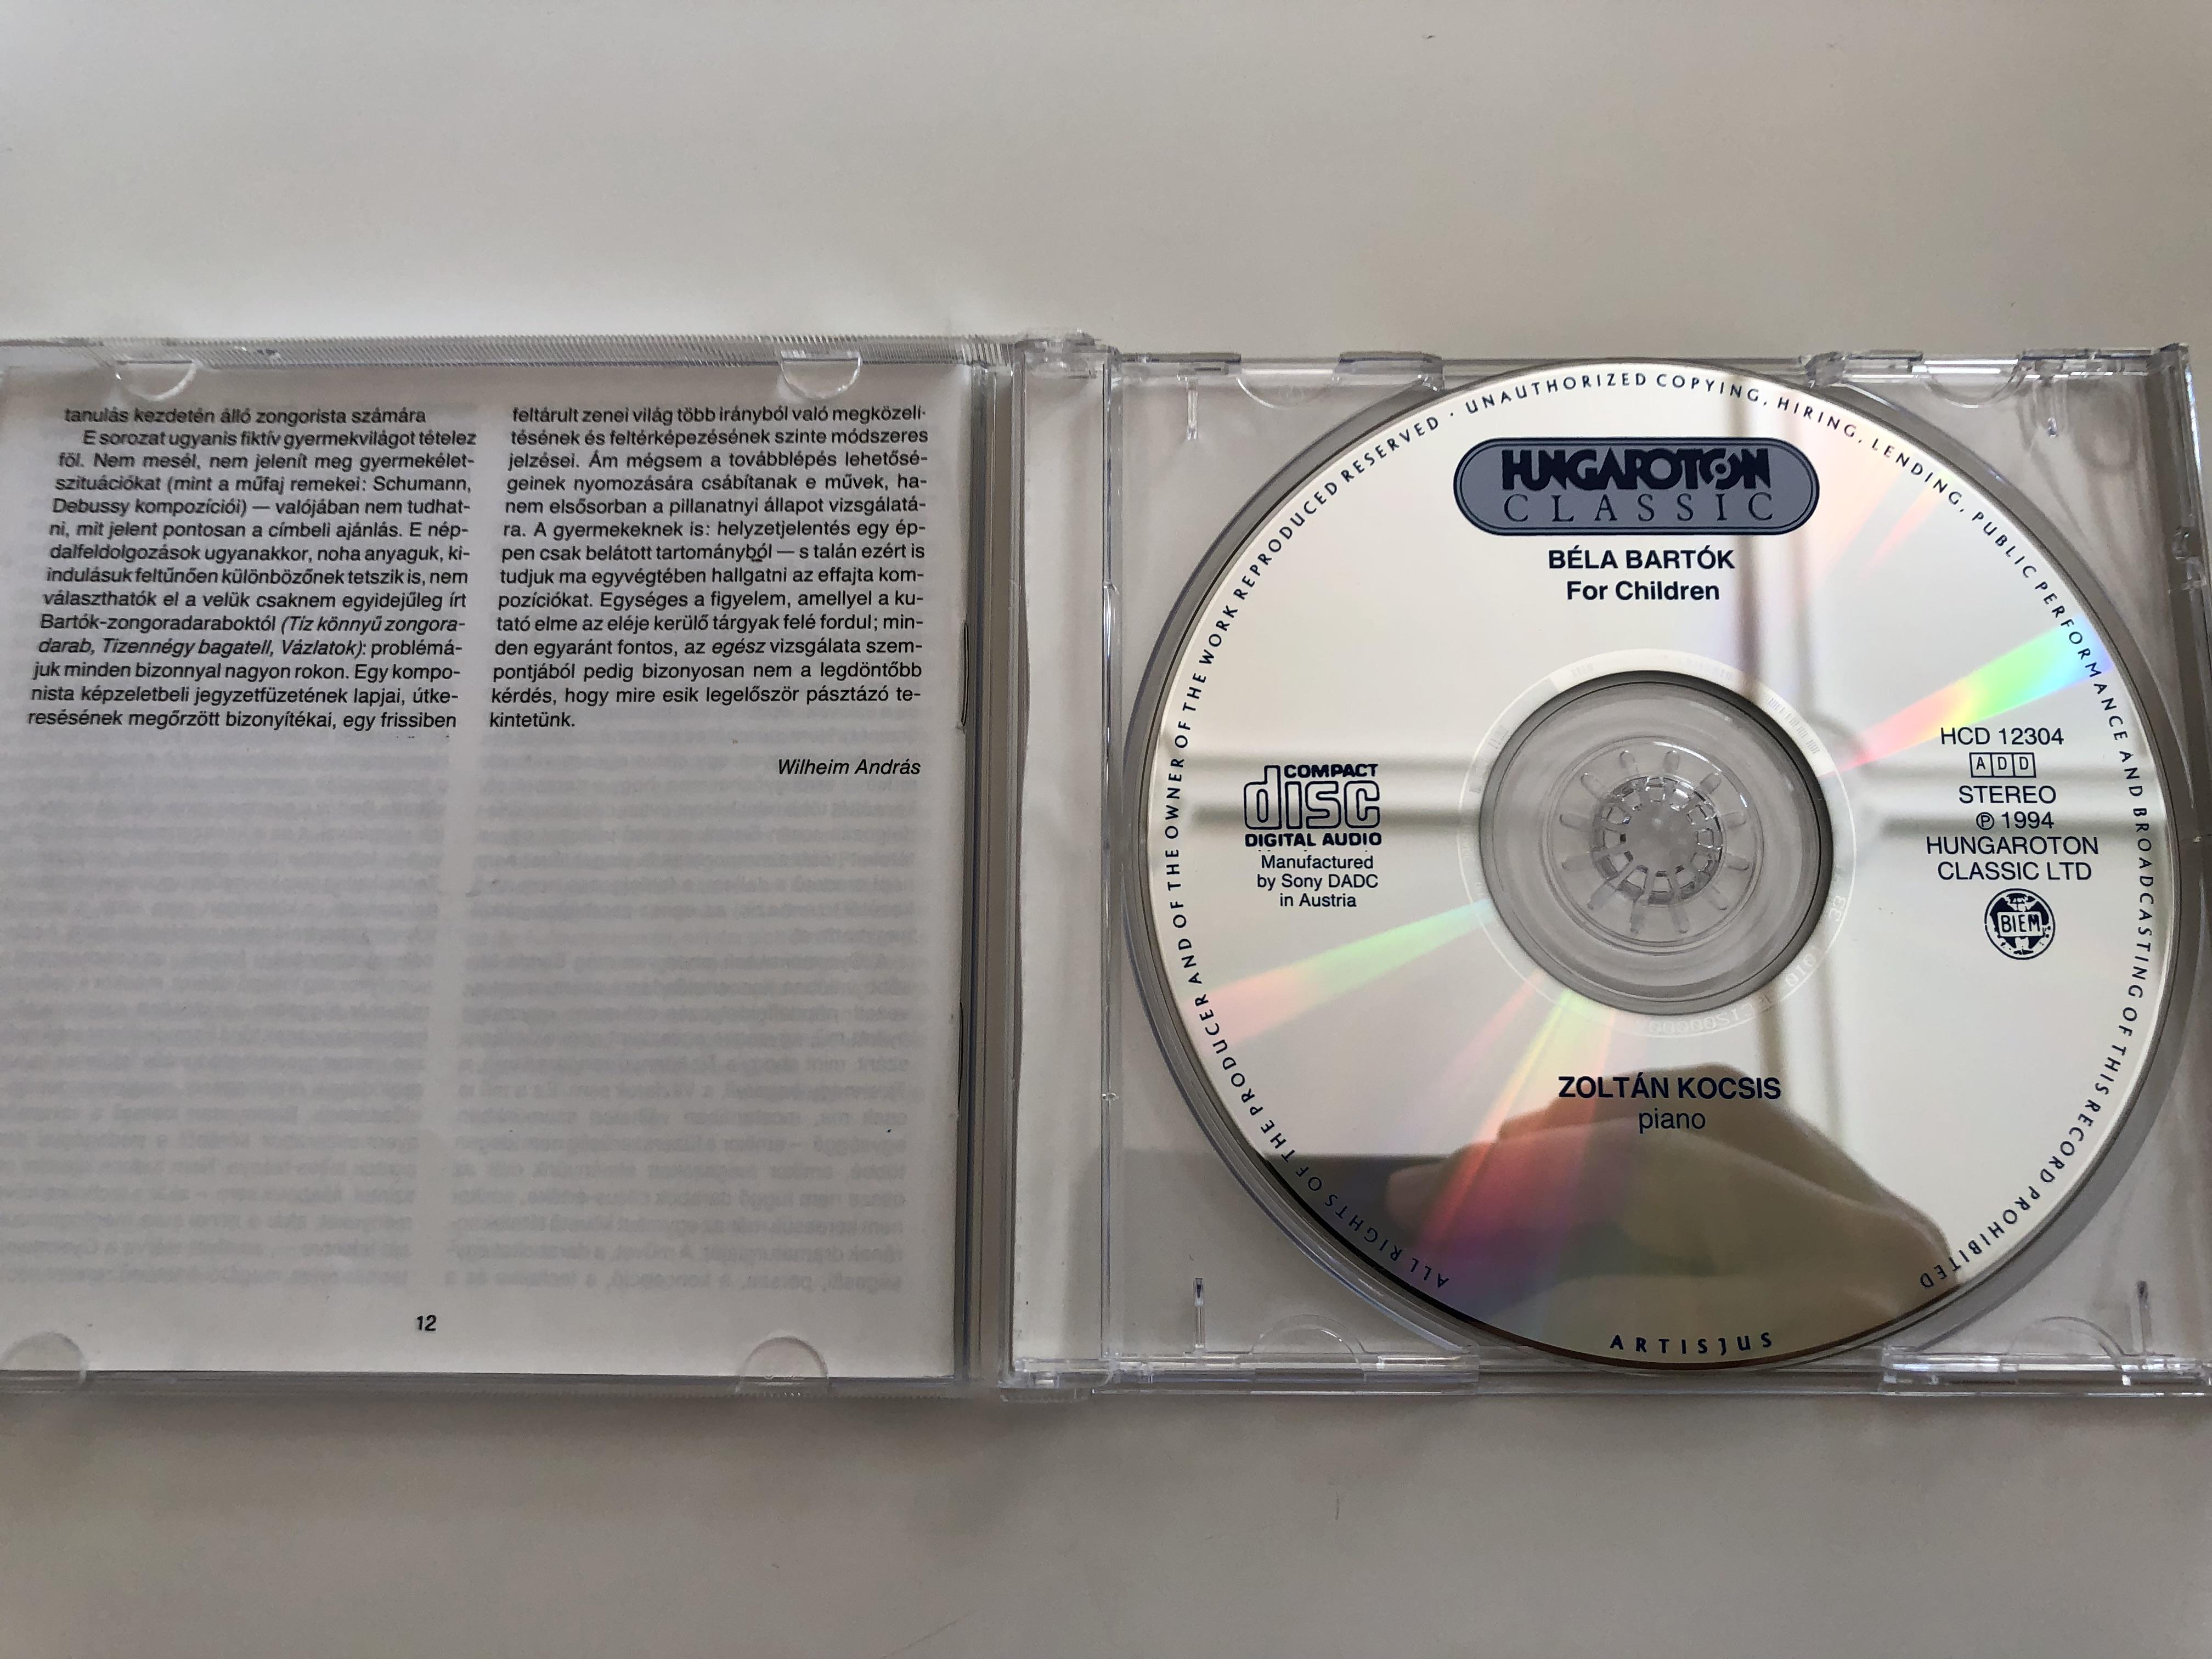 b-la-bart-k-for-children-piano-solo-vol-i-ii.-zolt-n-kocsis-piano-hungaroton-classic-audio-cd-1994-hcd-12304-boosey-hawkes-6-.jpg